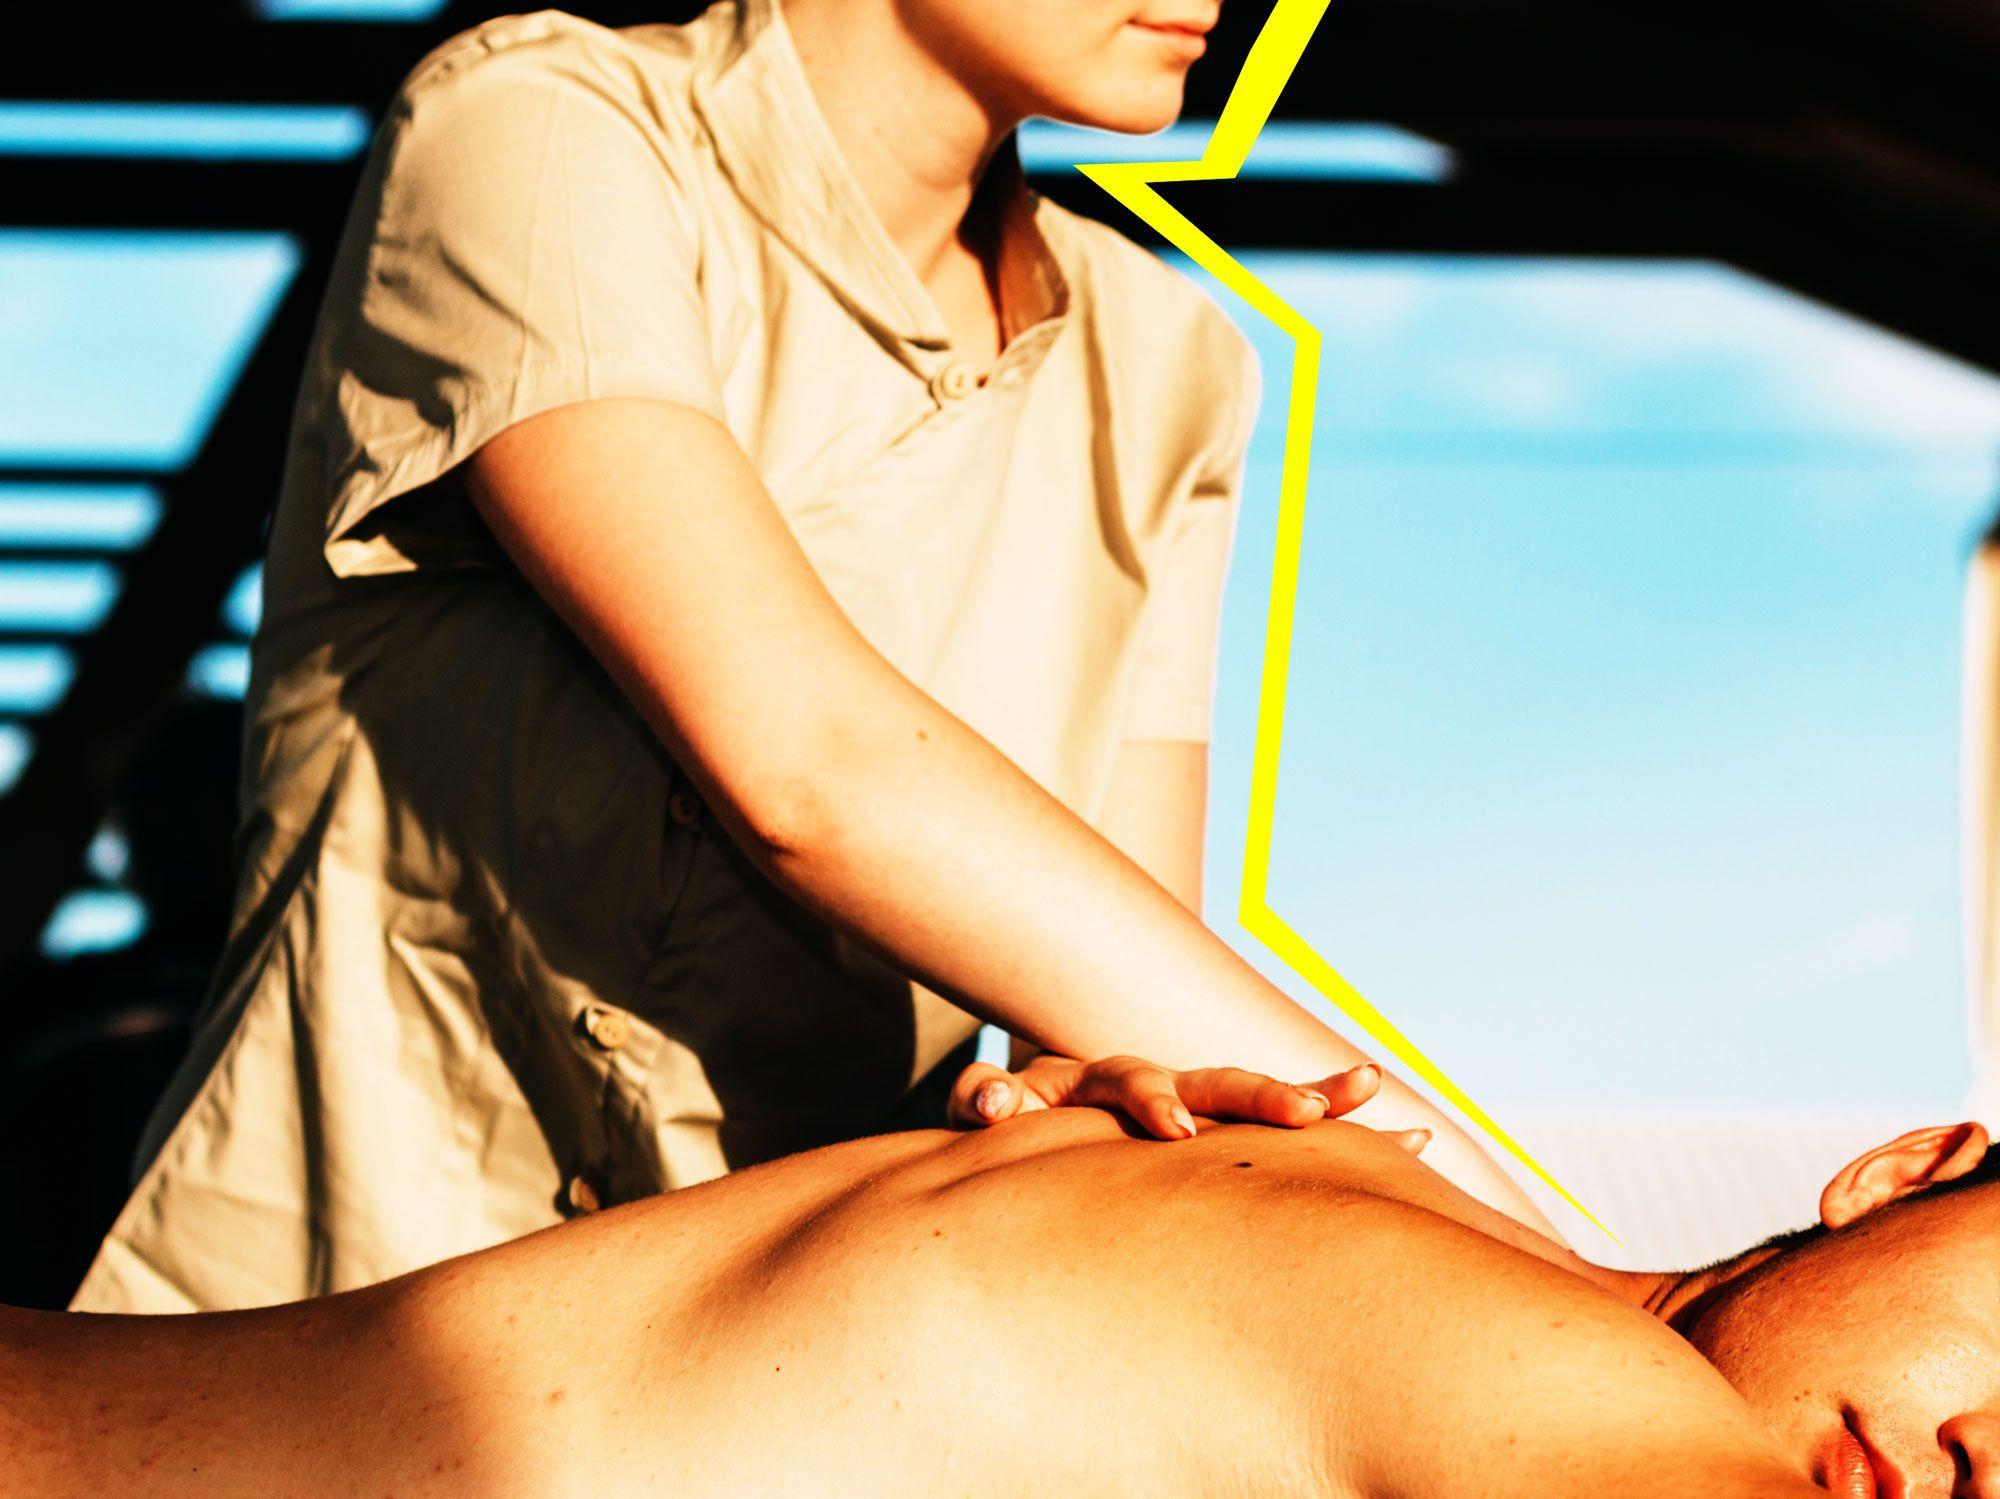 masaj penis în salon)